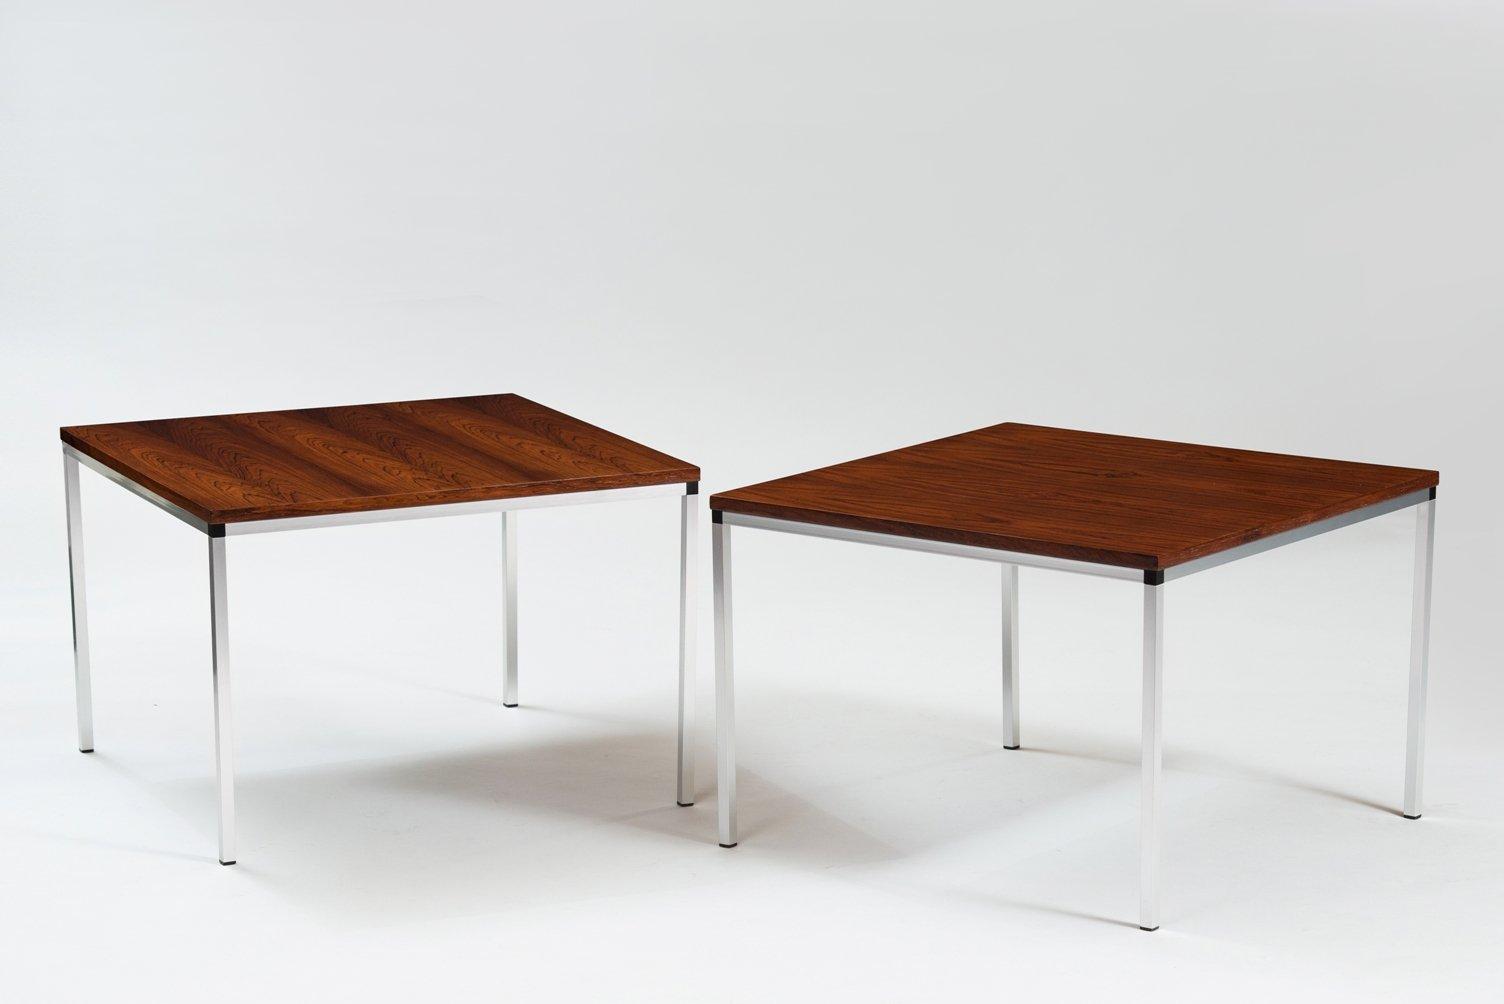 Vintage German Rosewood & Chrome Side Tables, Set of 2 for sale at ...